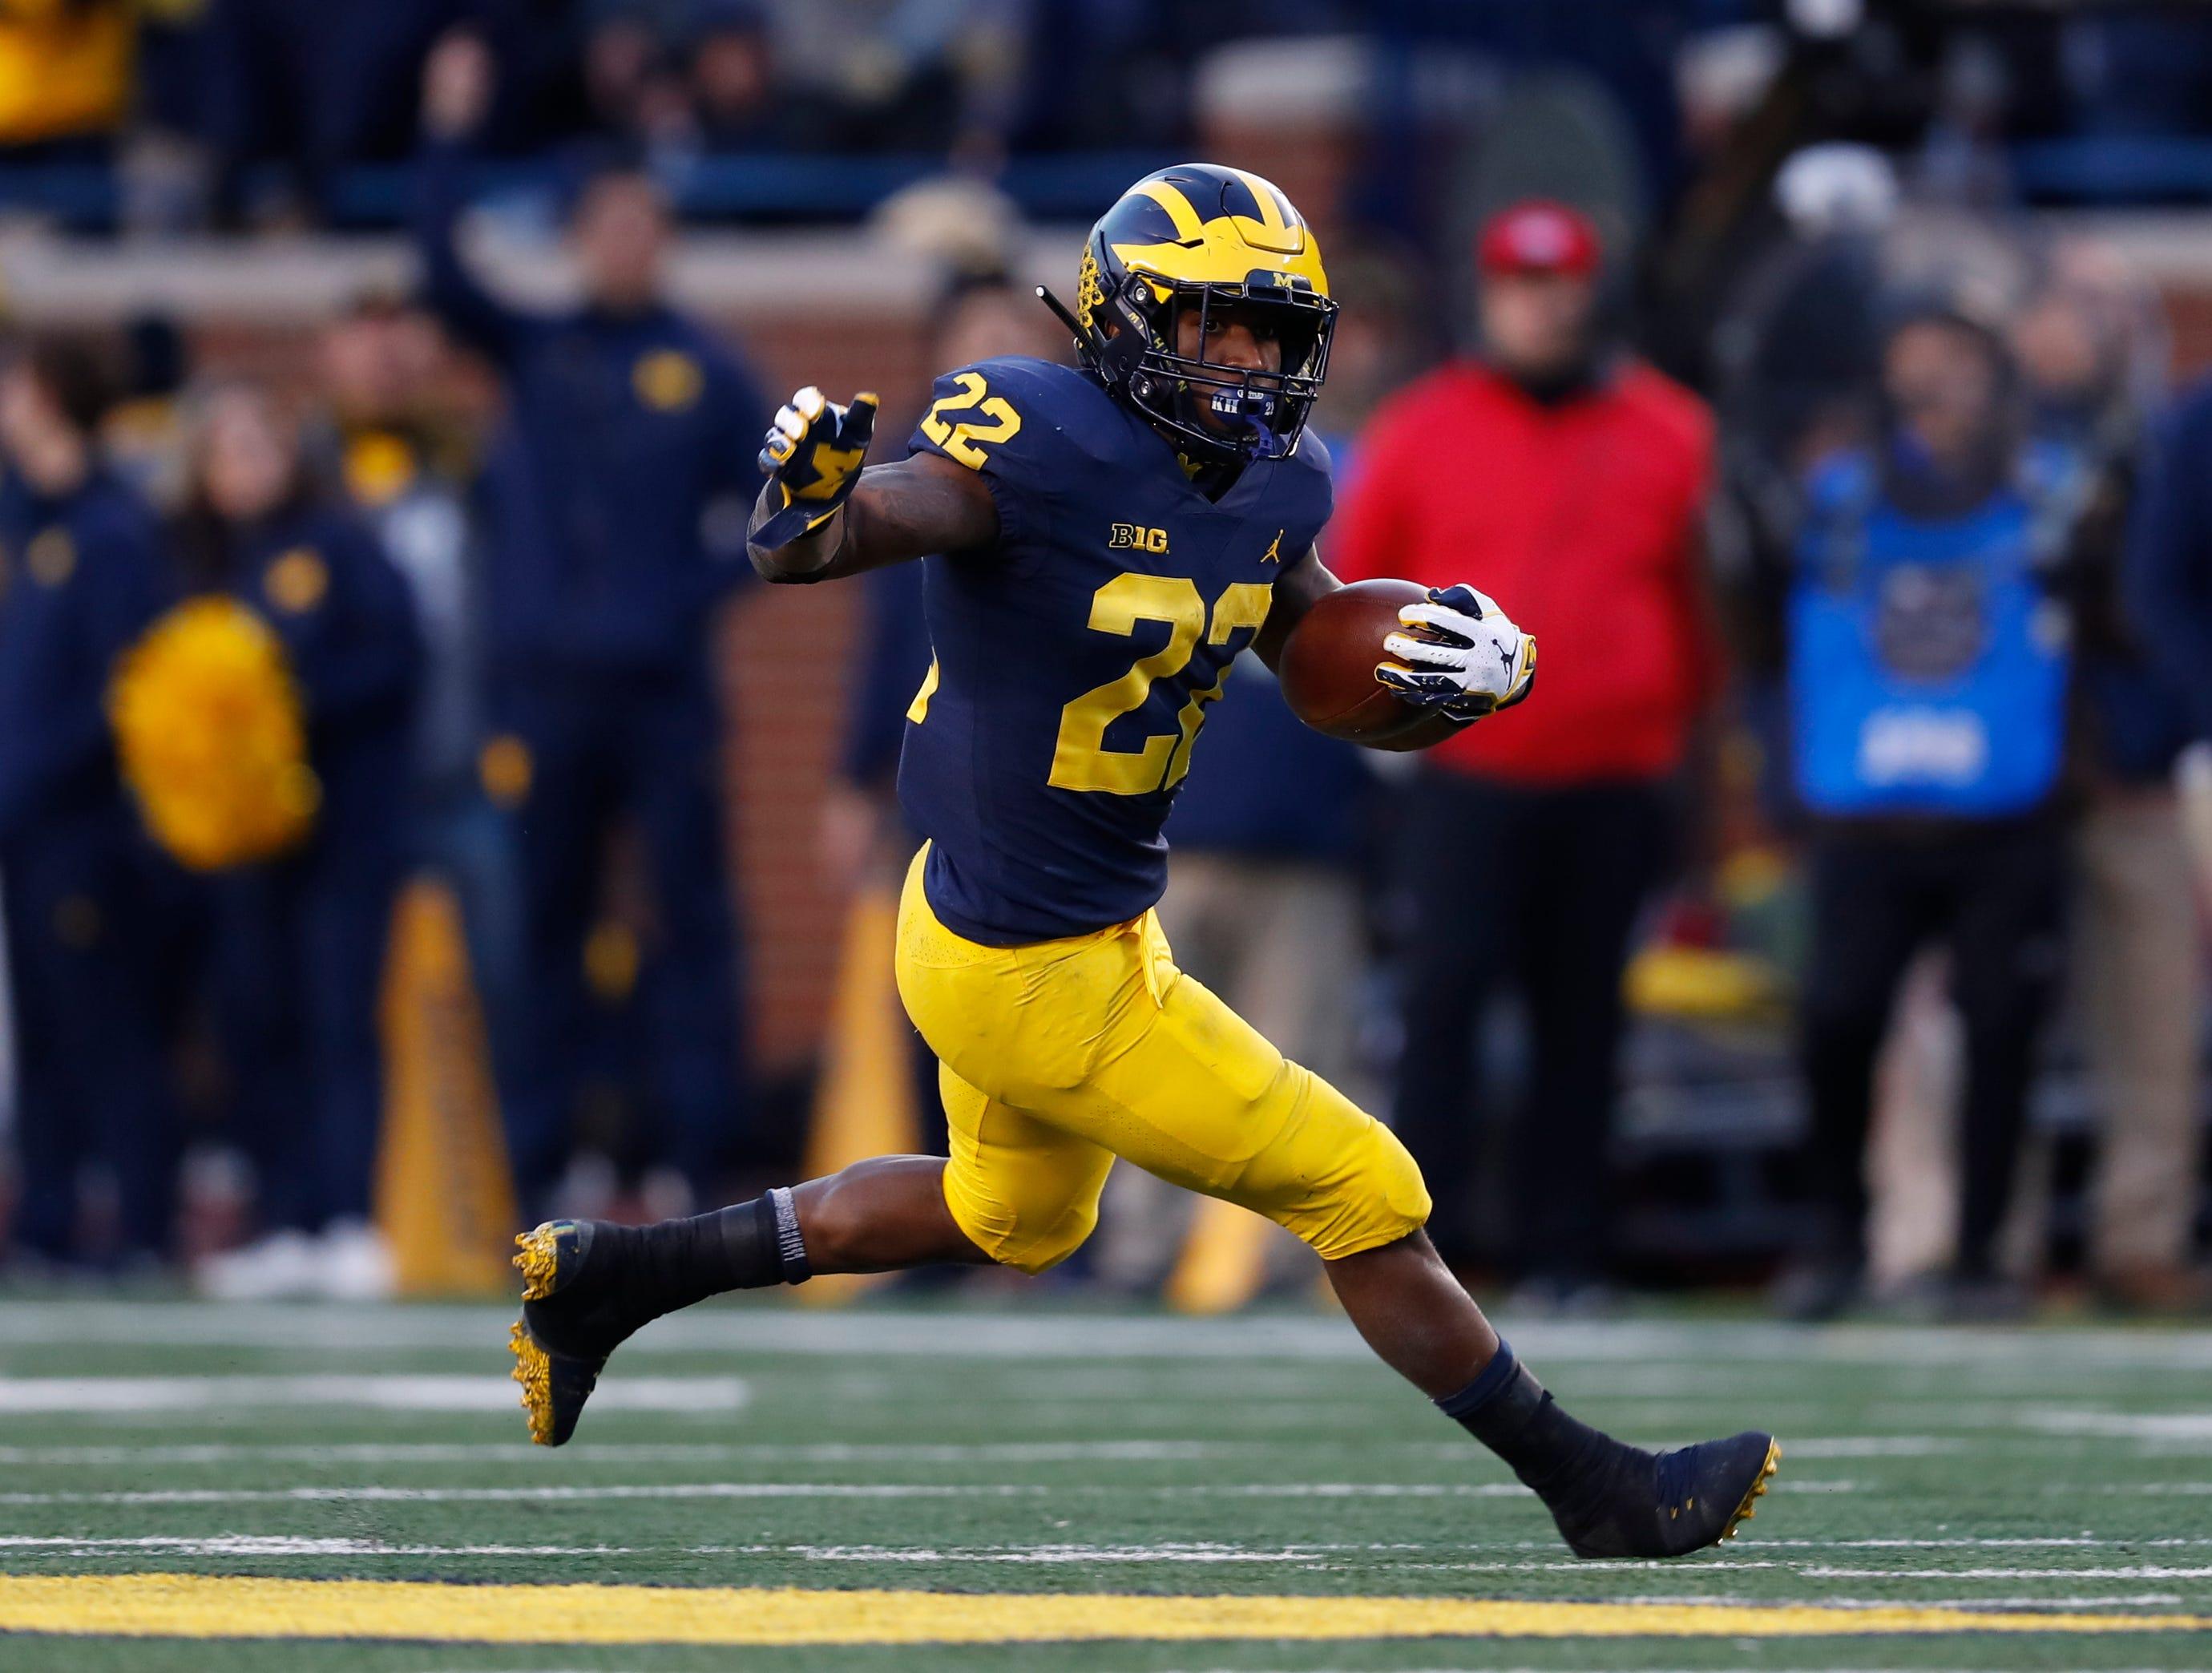 Michigan running back Karan Higdon runs against Penn State in the second half of an NCAA college football game in Ann Arbor, Mich., Saturday, Nov. 3, 2018. (AP Photo/Paul Sancya)